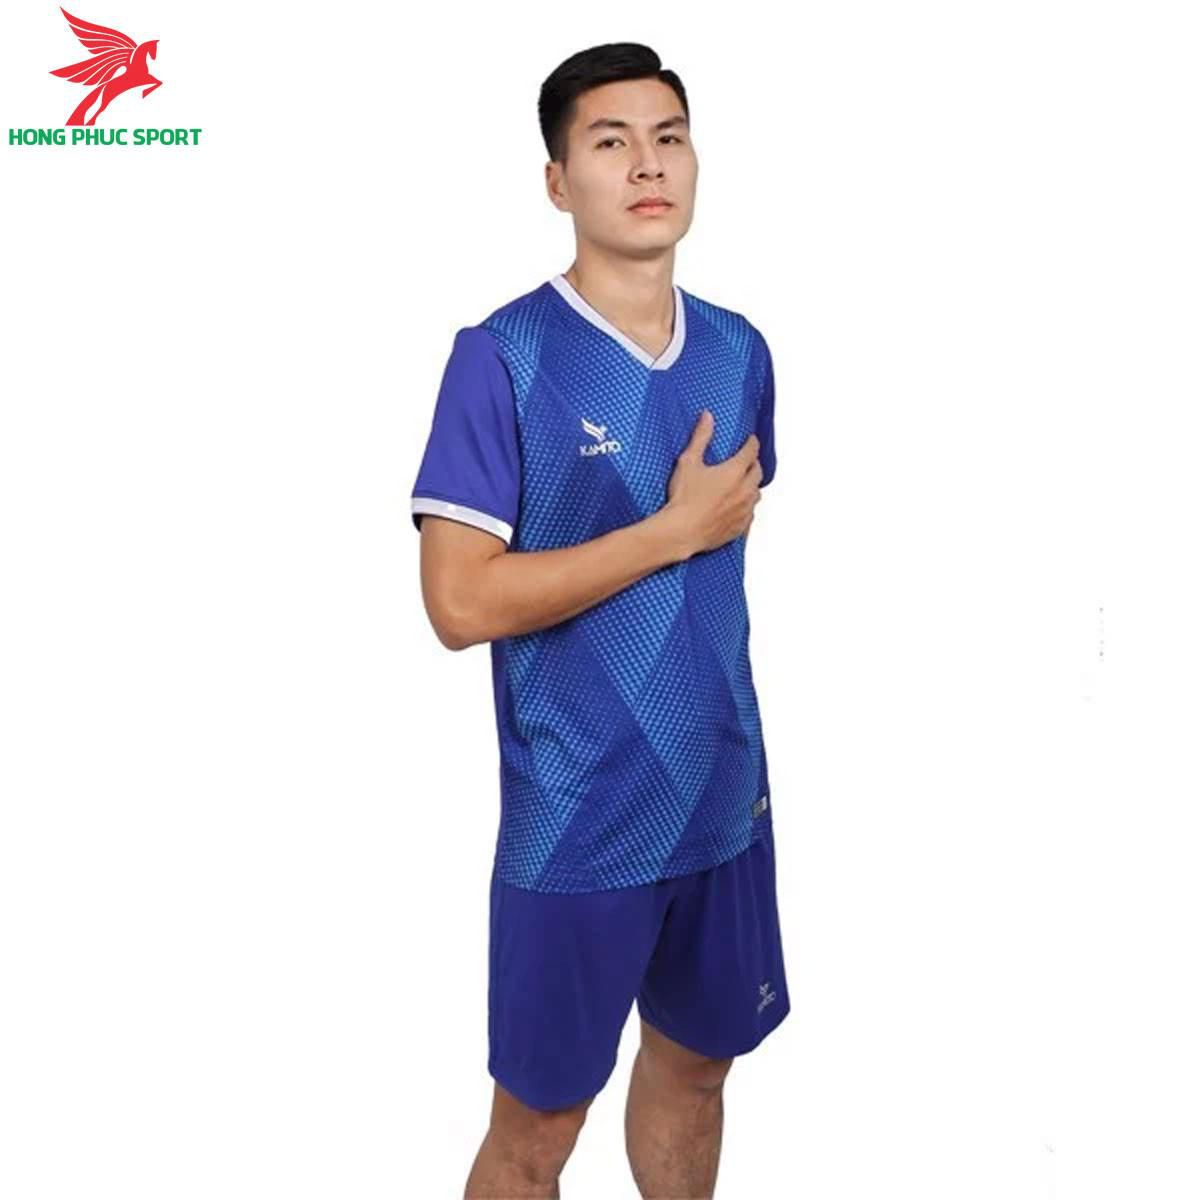 https://cdn.hongphucsport.com/unsafe/s4.shopbay.vn/files/285/ao-khong-logo-kamito-msh2101-mau-xanh-duong-2-6052db2131d3a.jpg